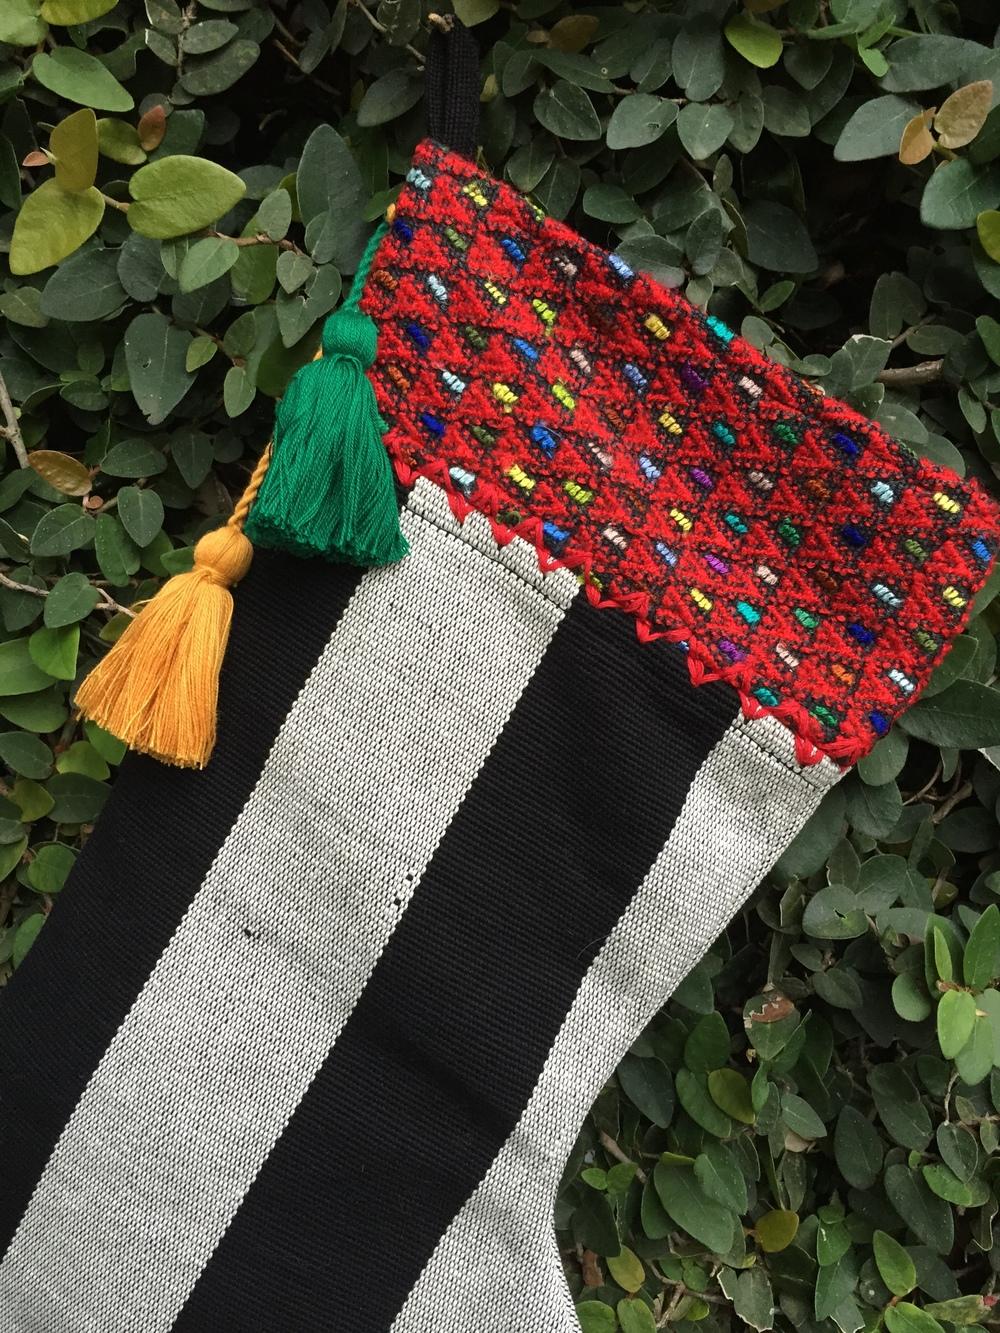 LunaZorro_holiday_stockings_handwoven_in_Guatemala_2.jpg